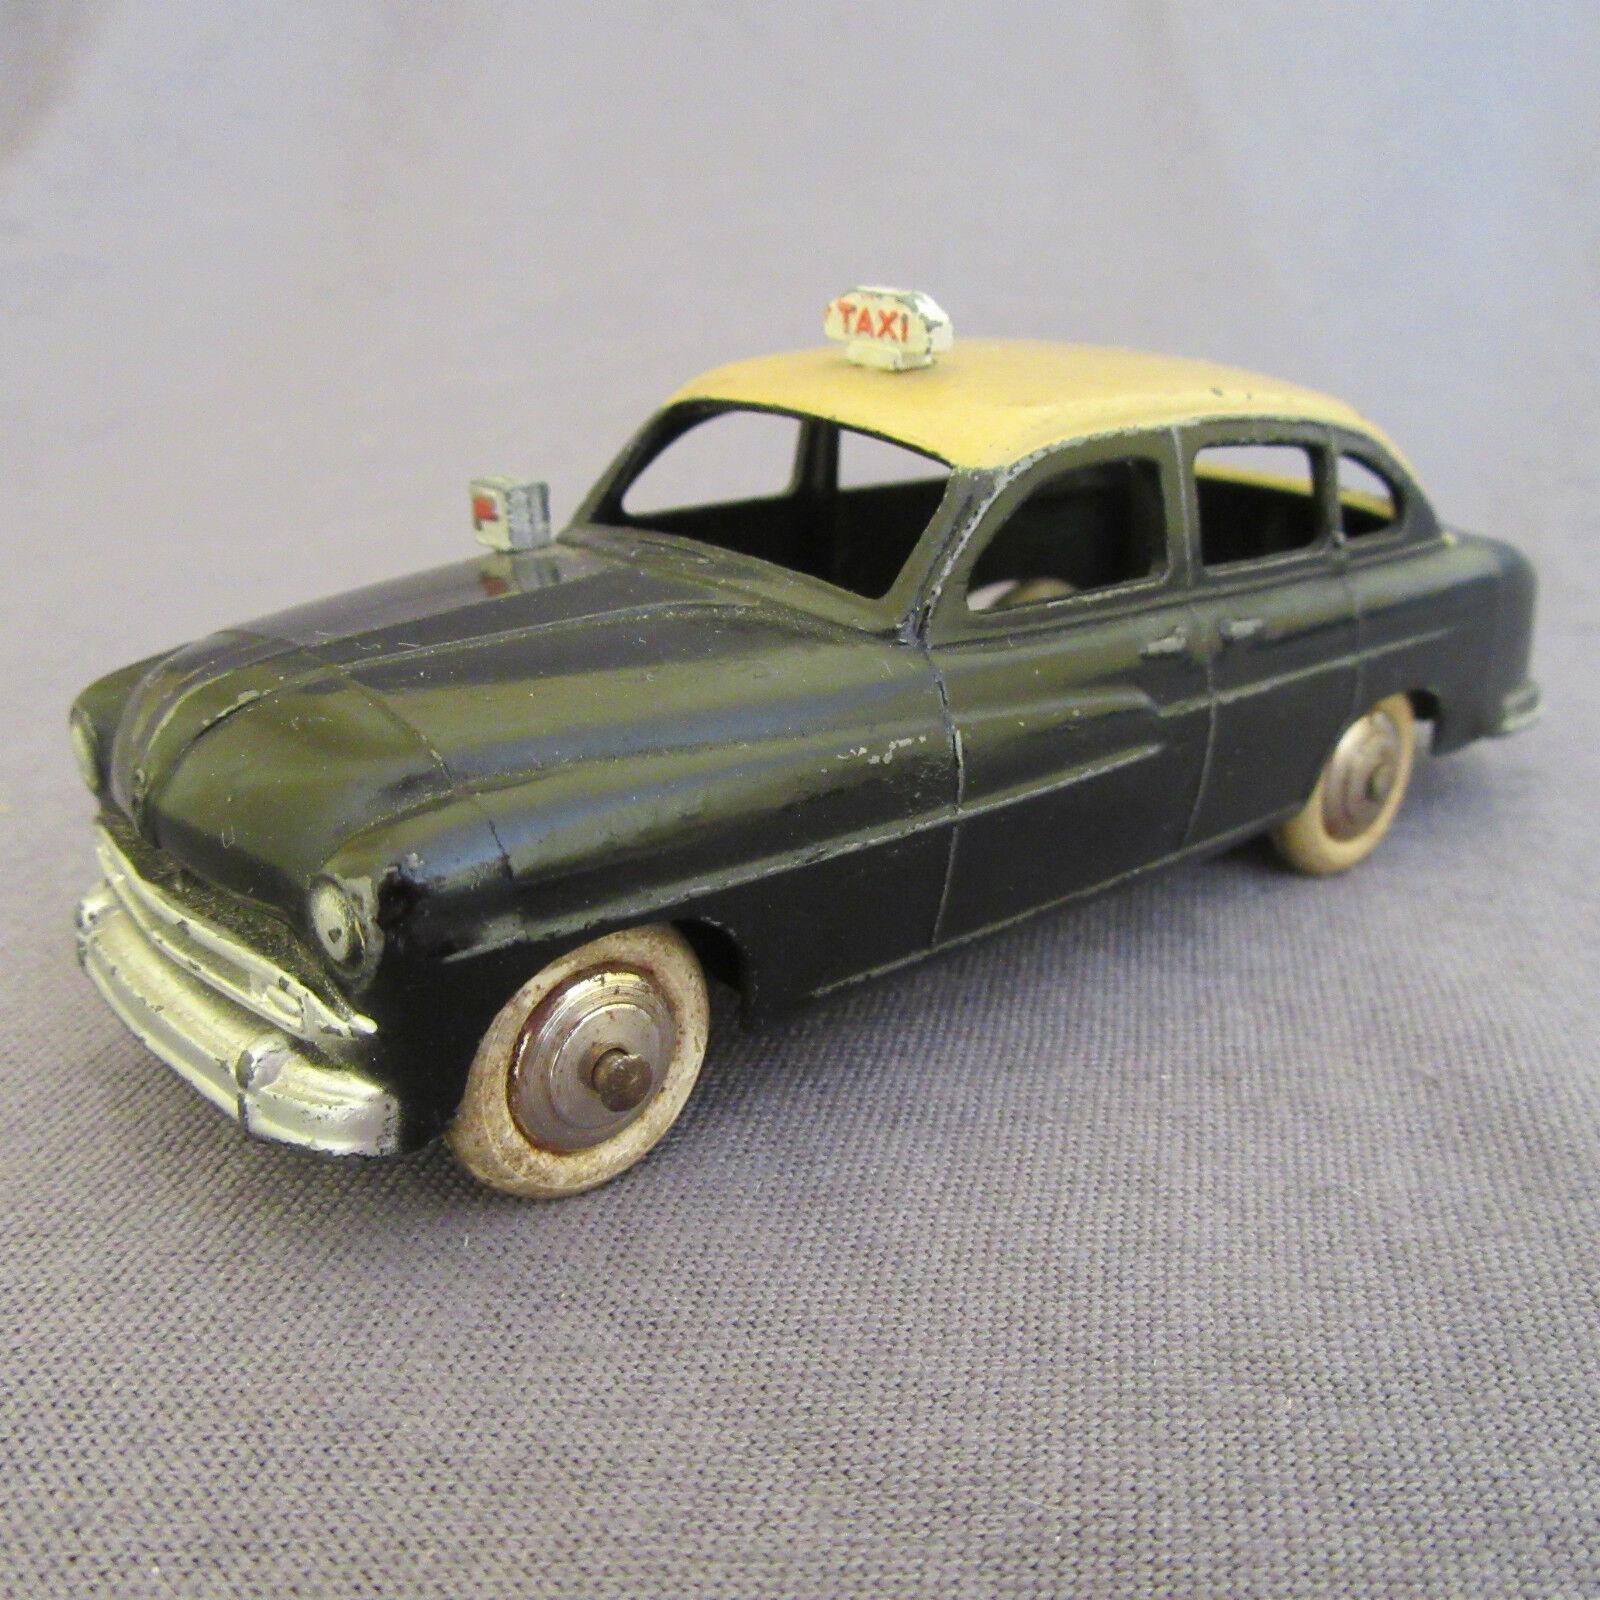 330E Dinky France 24X Ford Star 54 Taxi 1 43